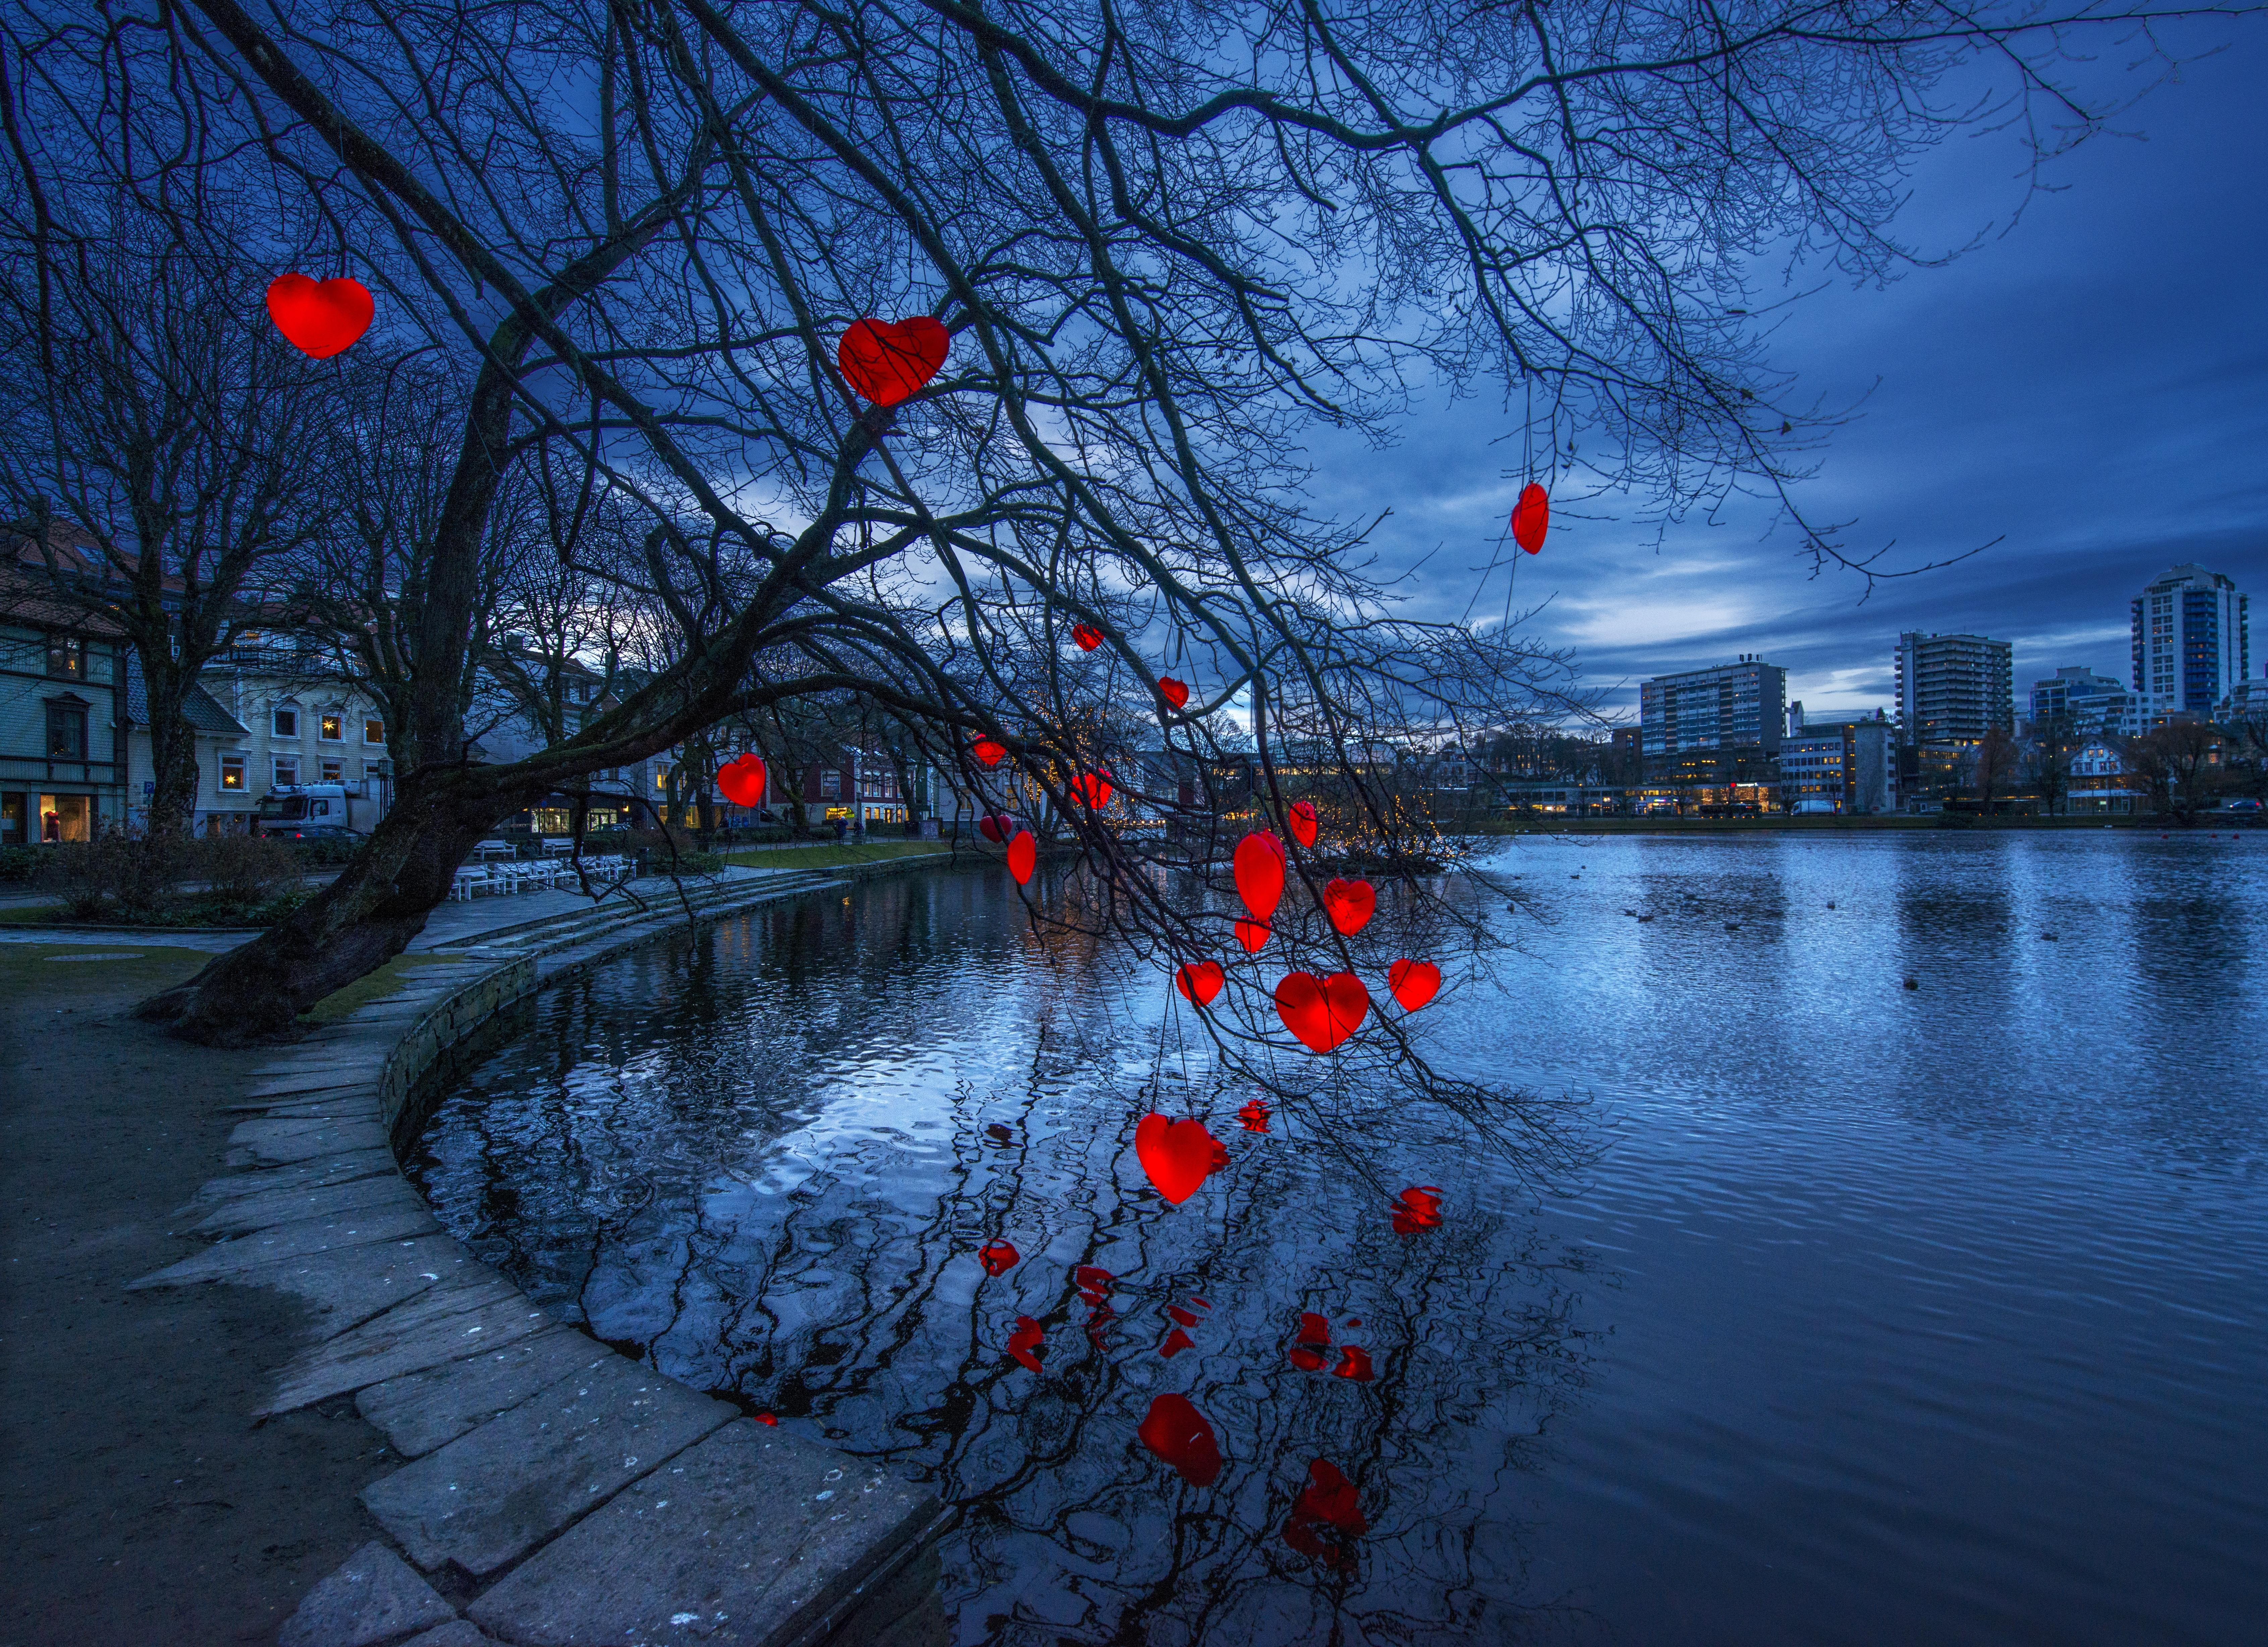 Рогаланд, Норвегия, Брейаватнет